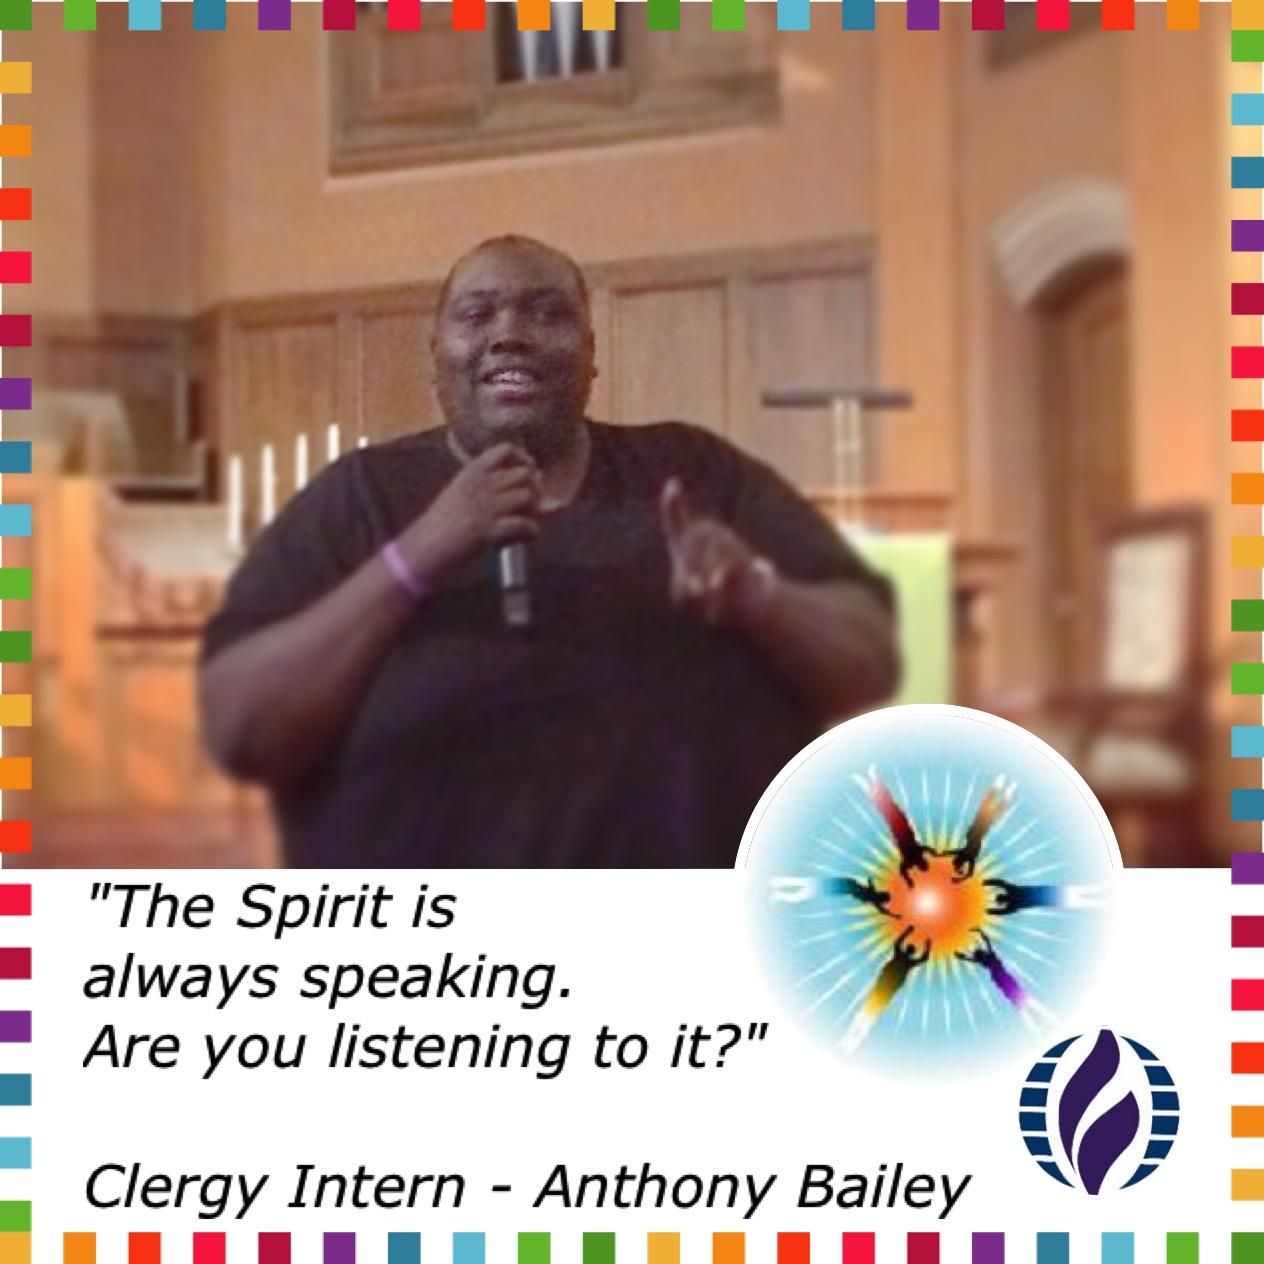 Anthony Bailey  - Intern